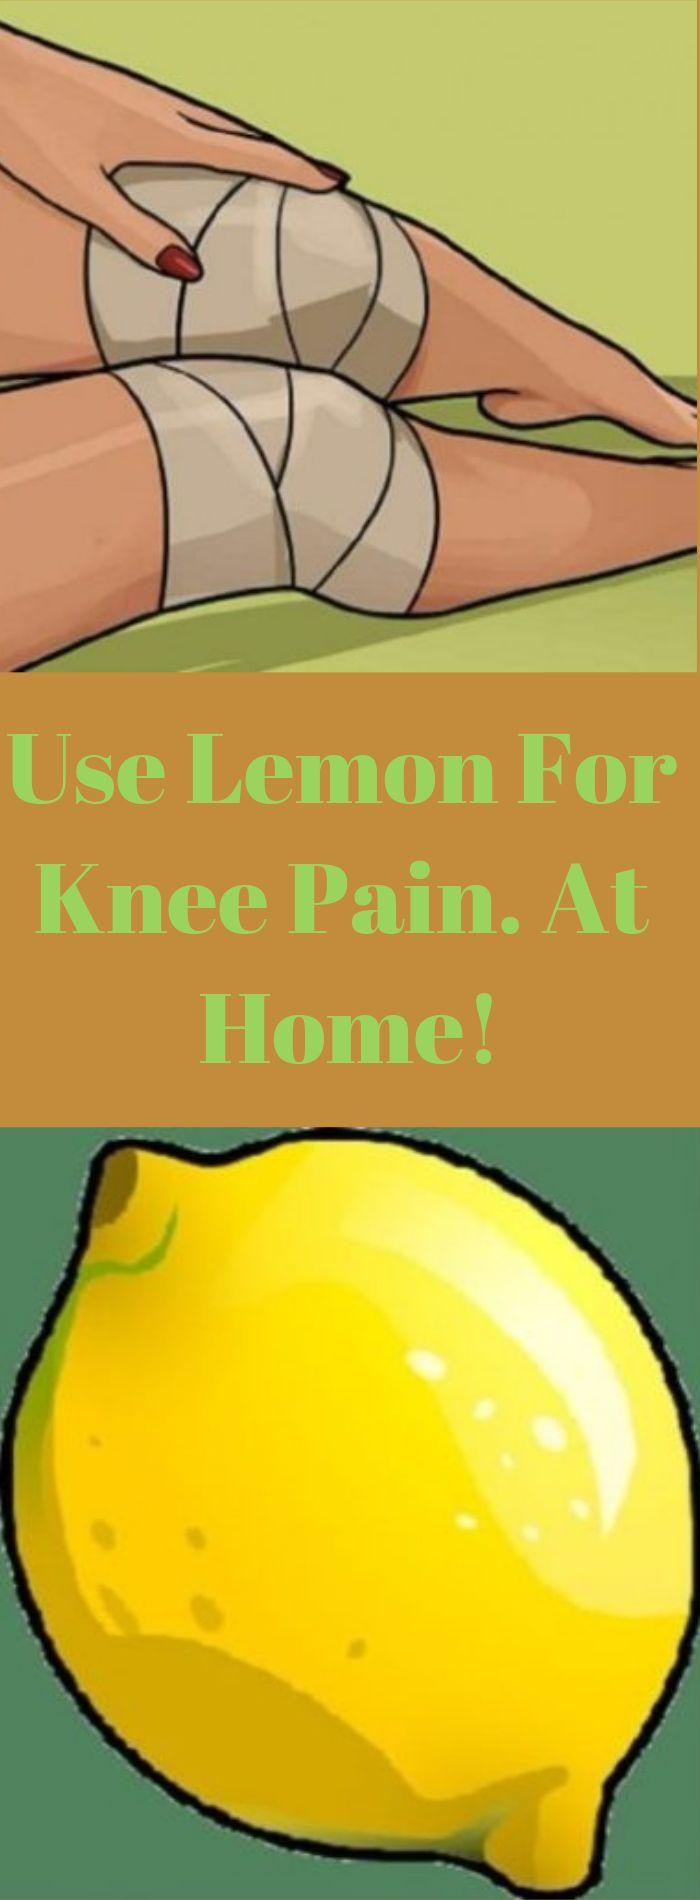 Cefac pt dureri de genunchi